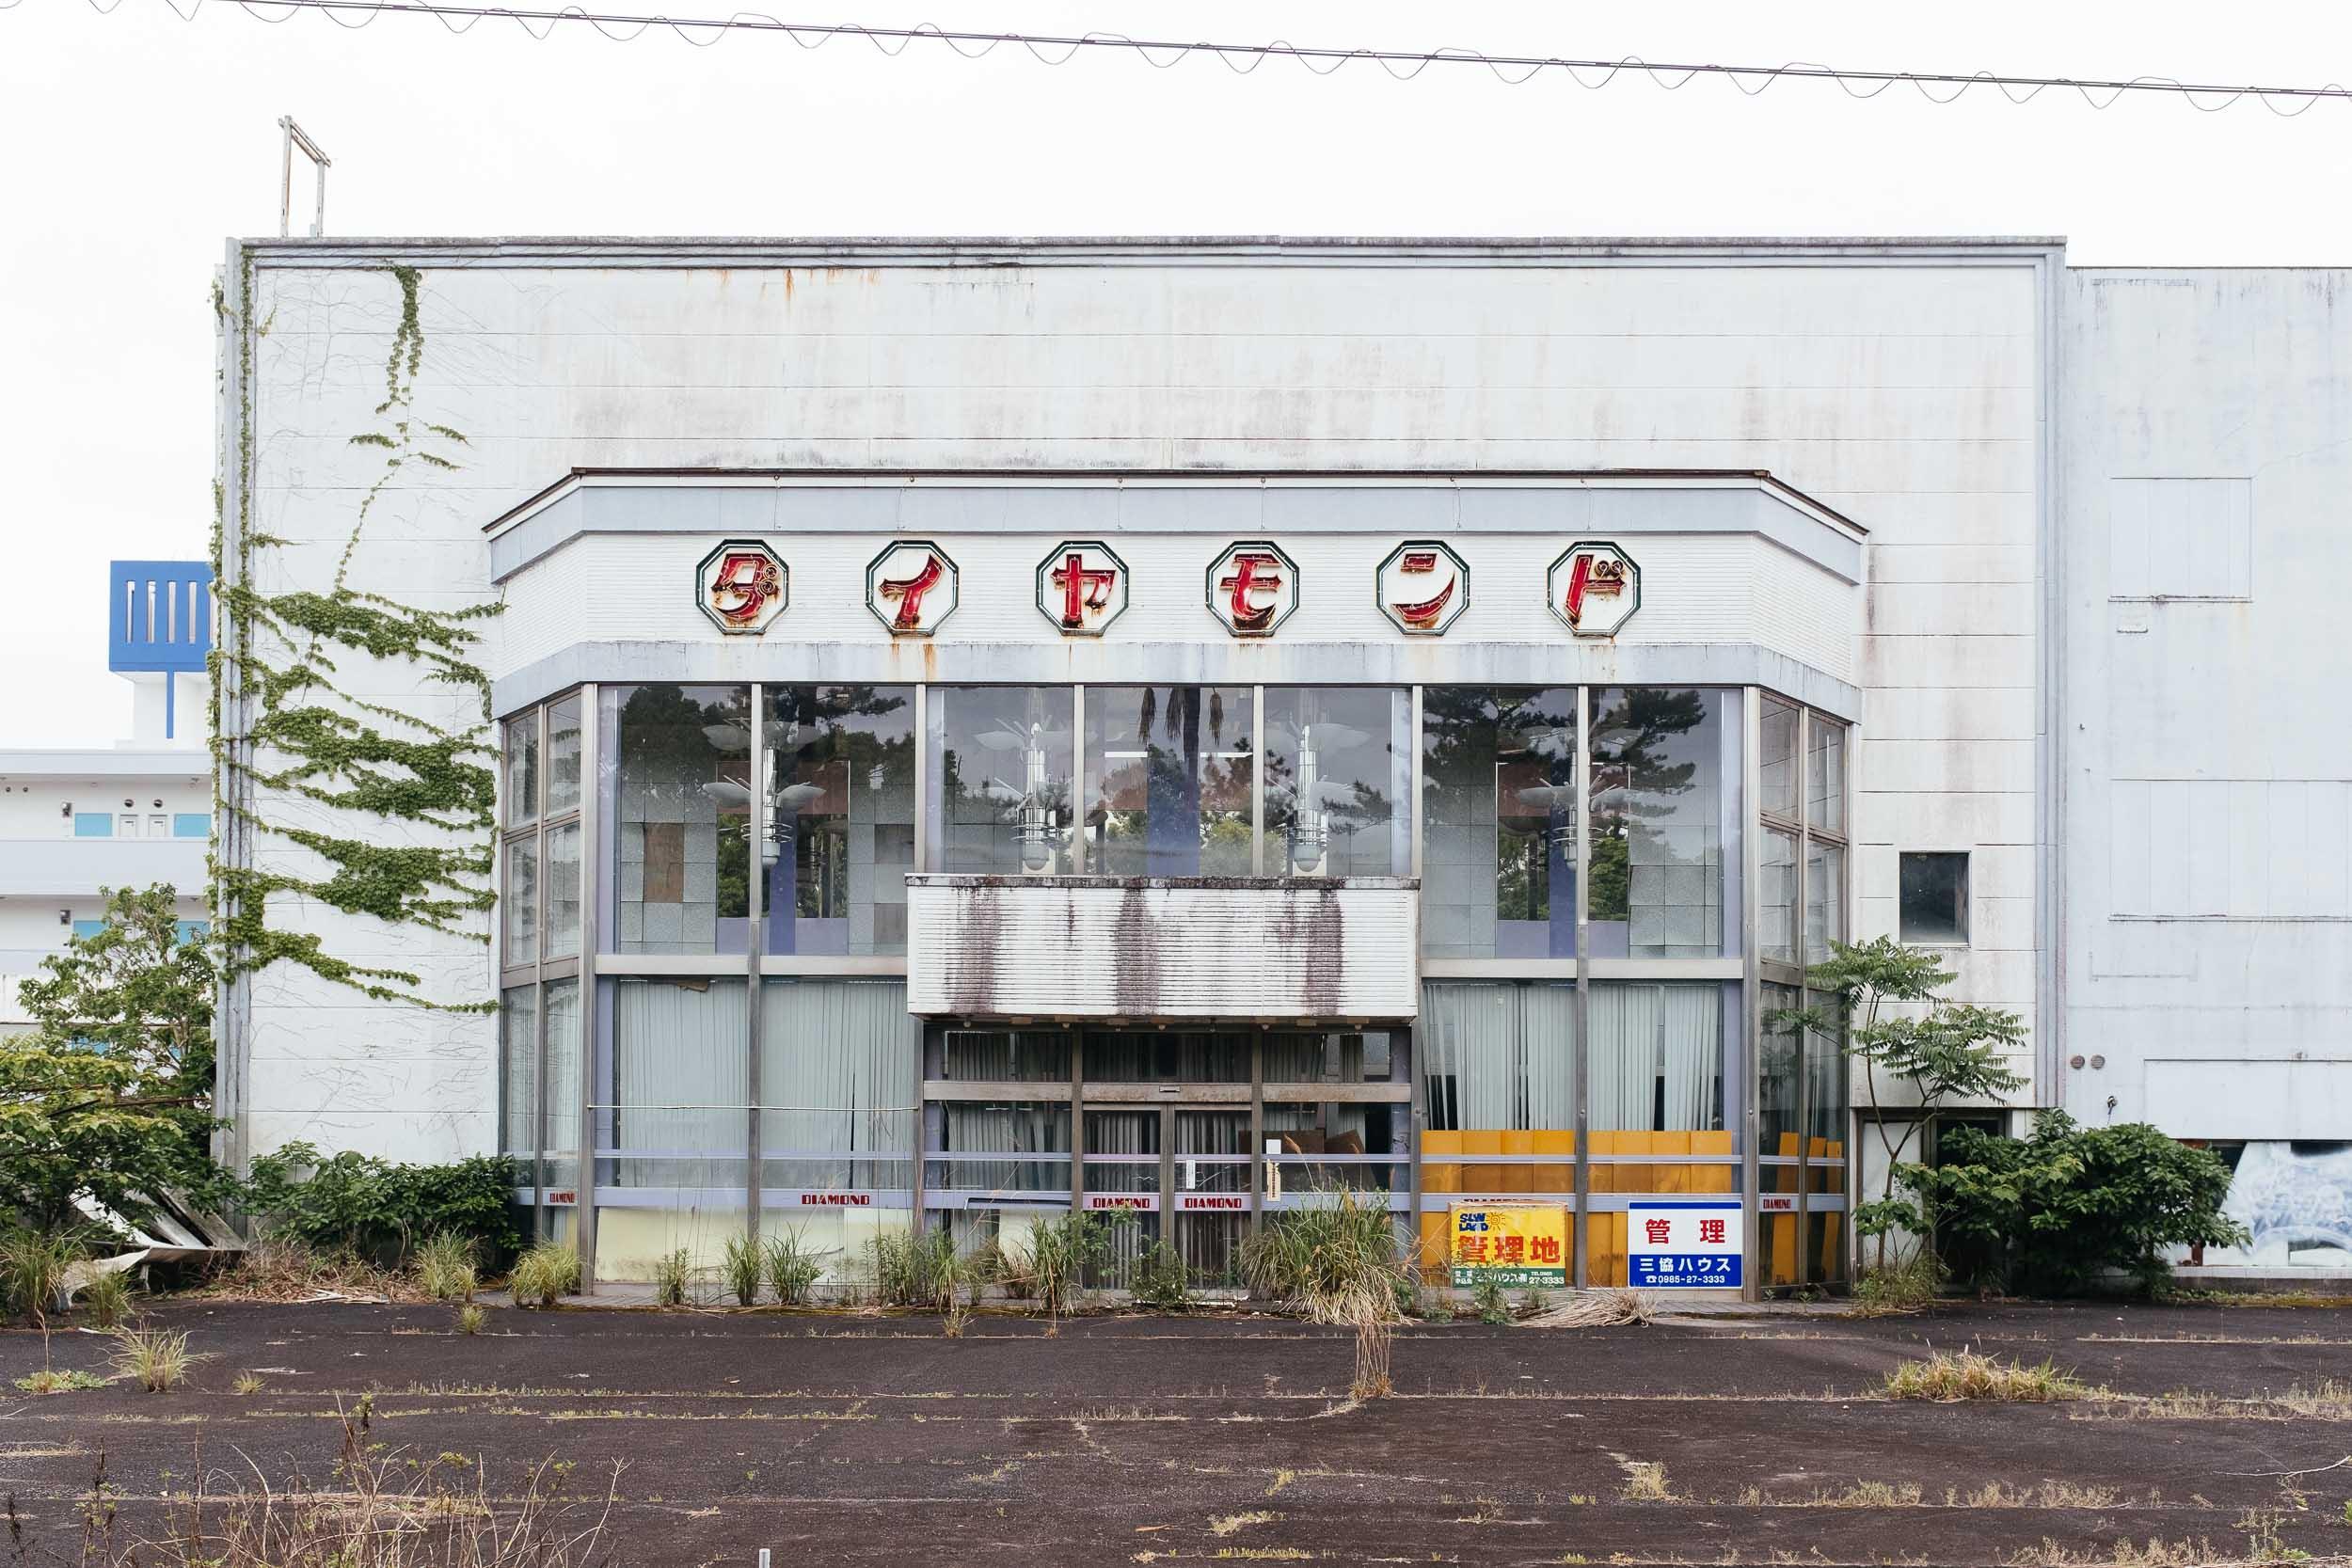 20180425-Kagoshima-041.jpg